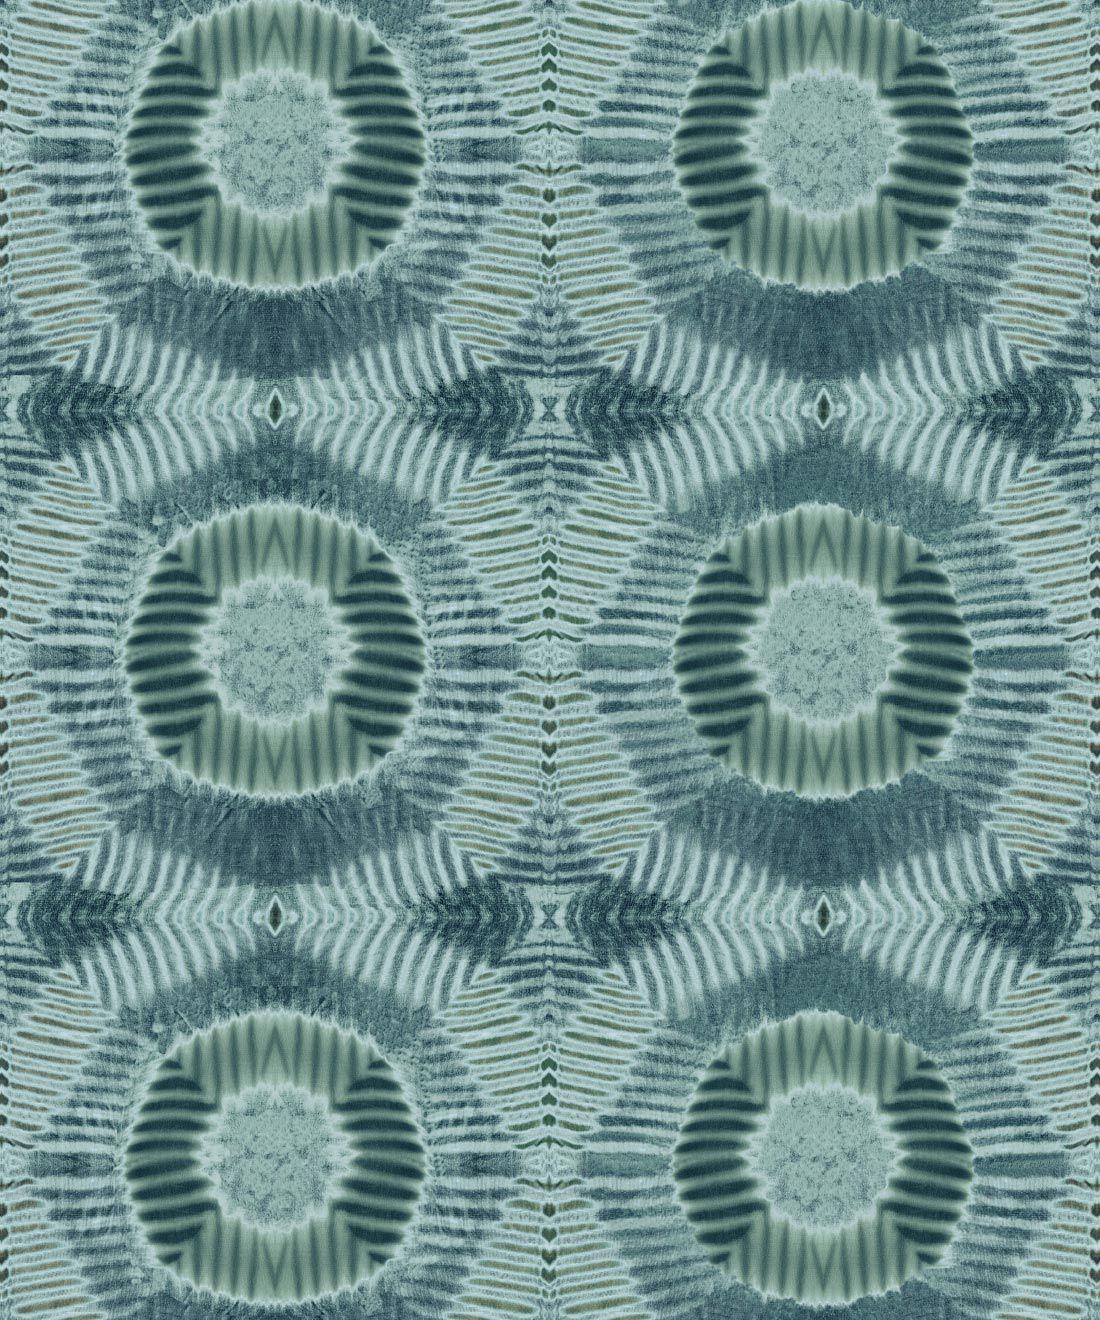 Aztec Suns Wallpaper Sage • Shibori Geometric • Swatch